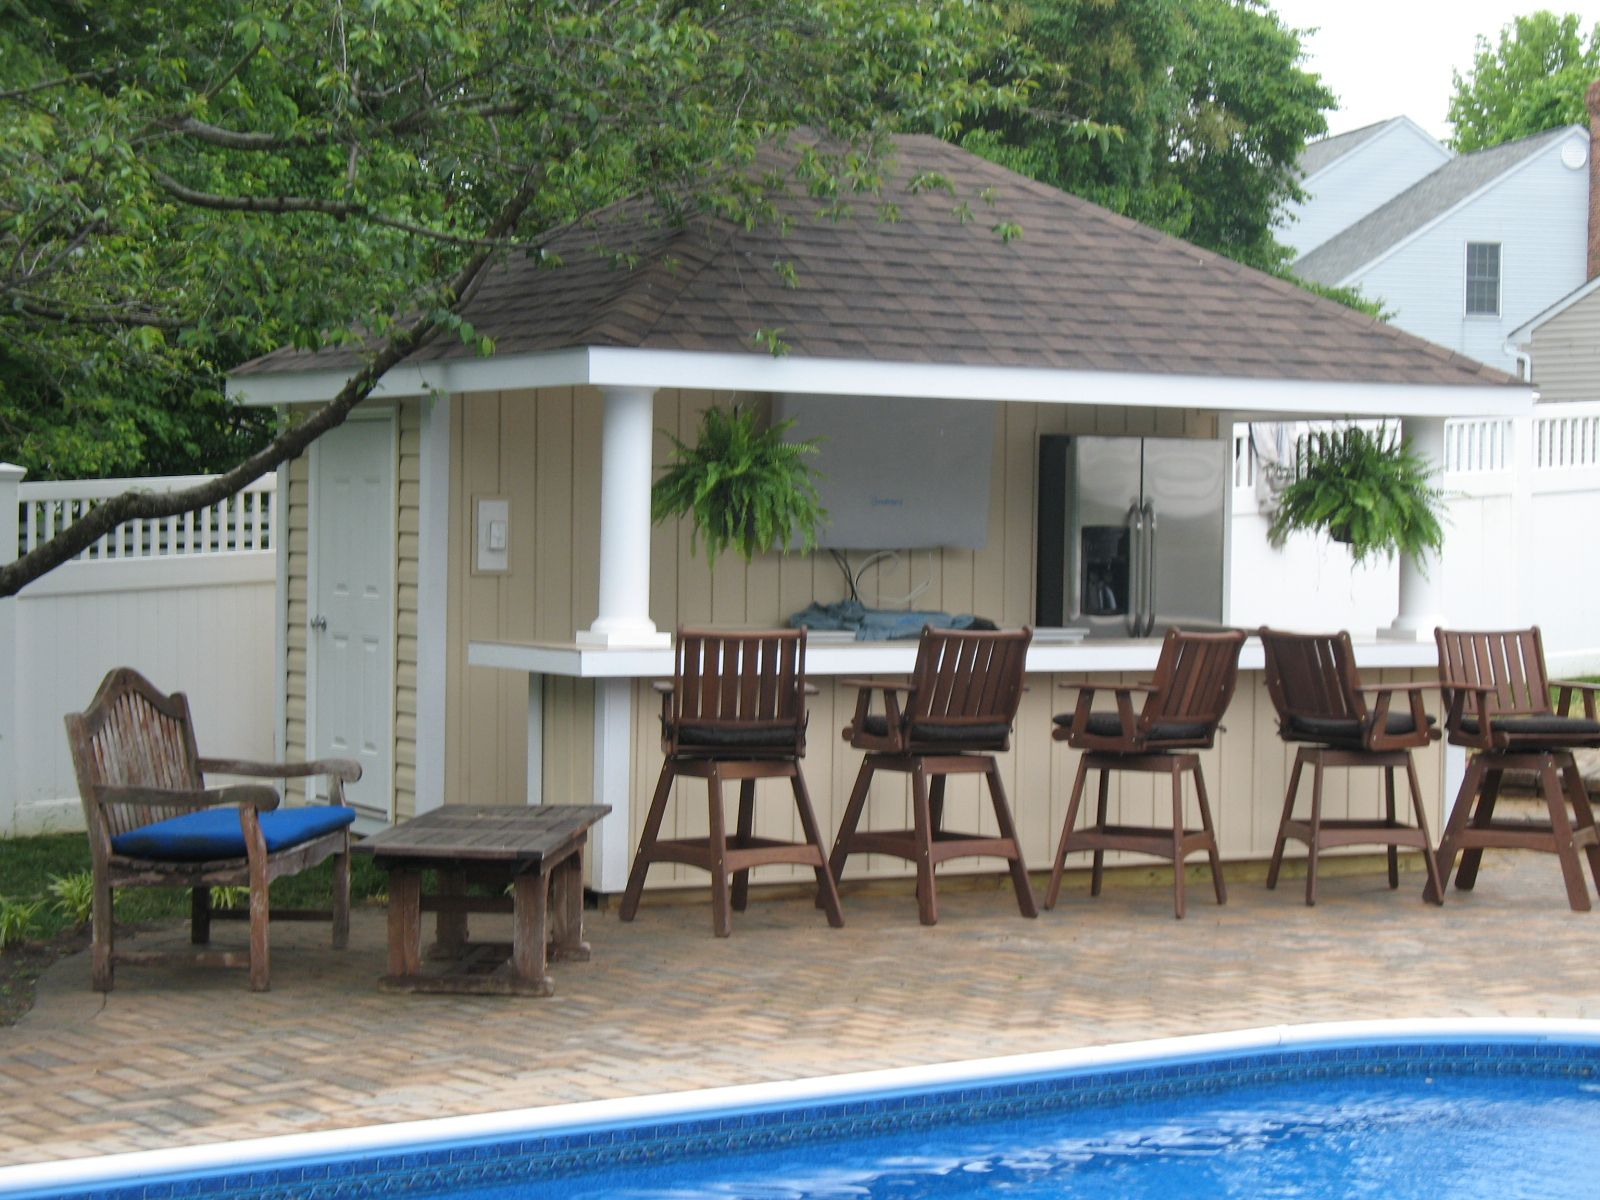 Pool Houses Sheds Bar 12' X 14' Siesta Poolside Bar Vinyl